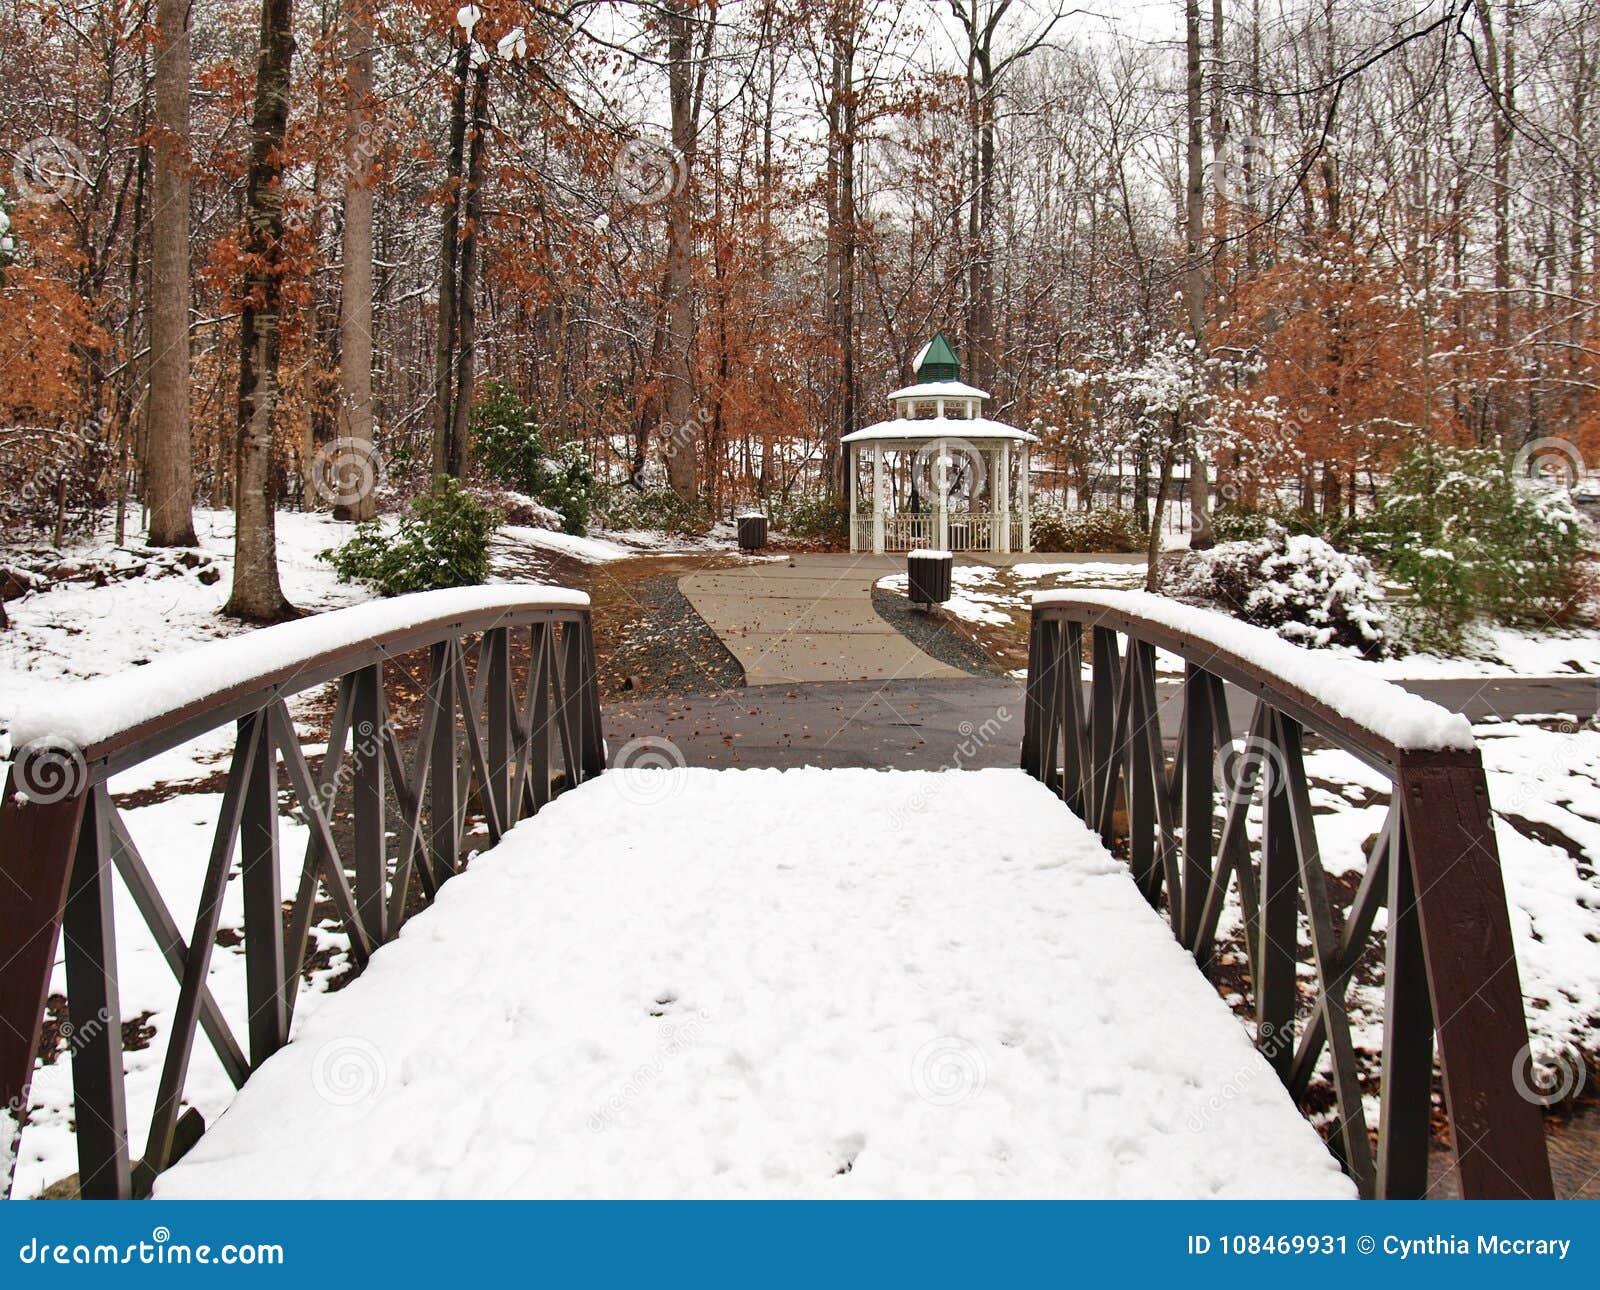 C G Heuvel Memorial Park